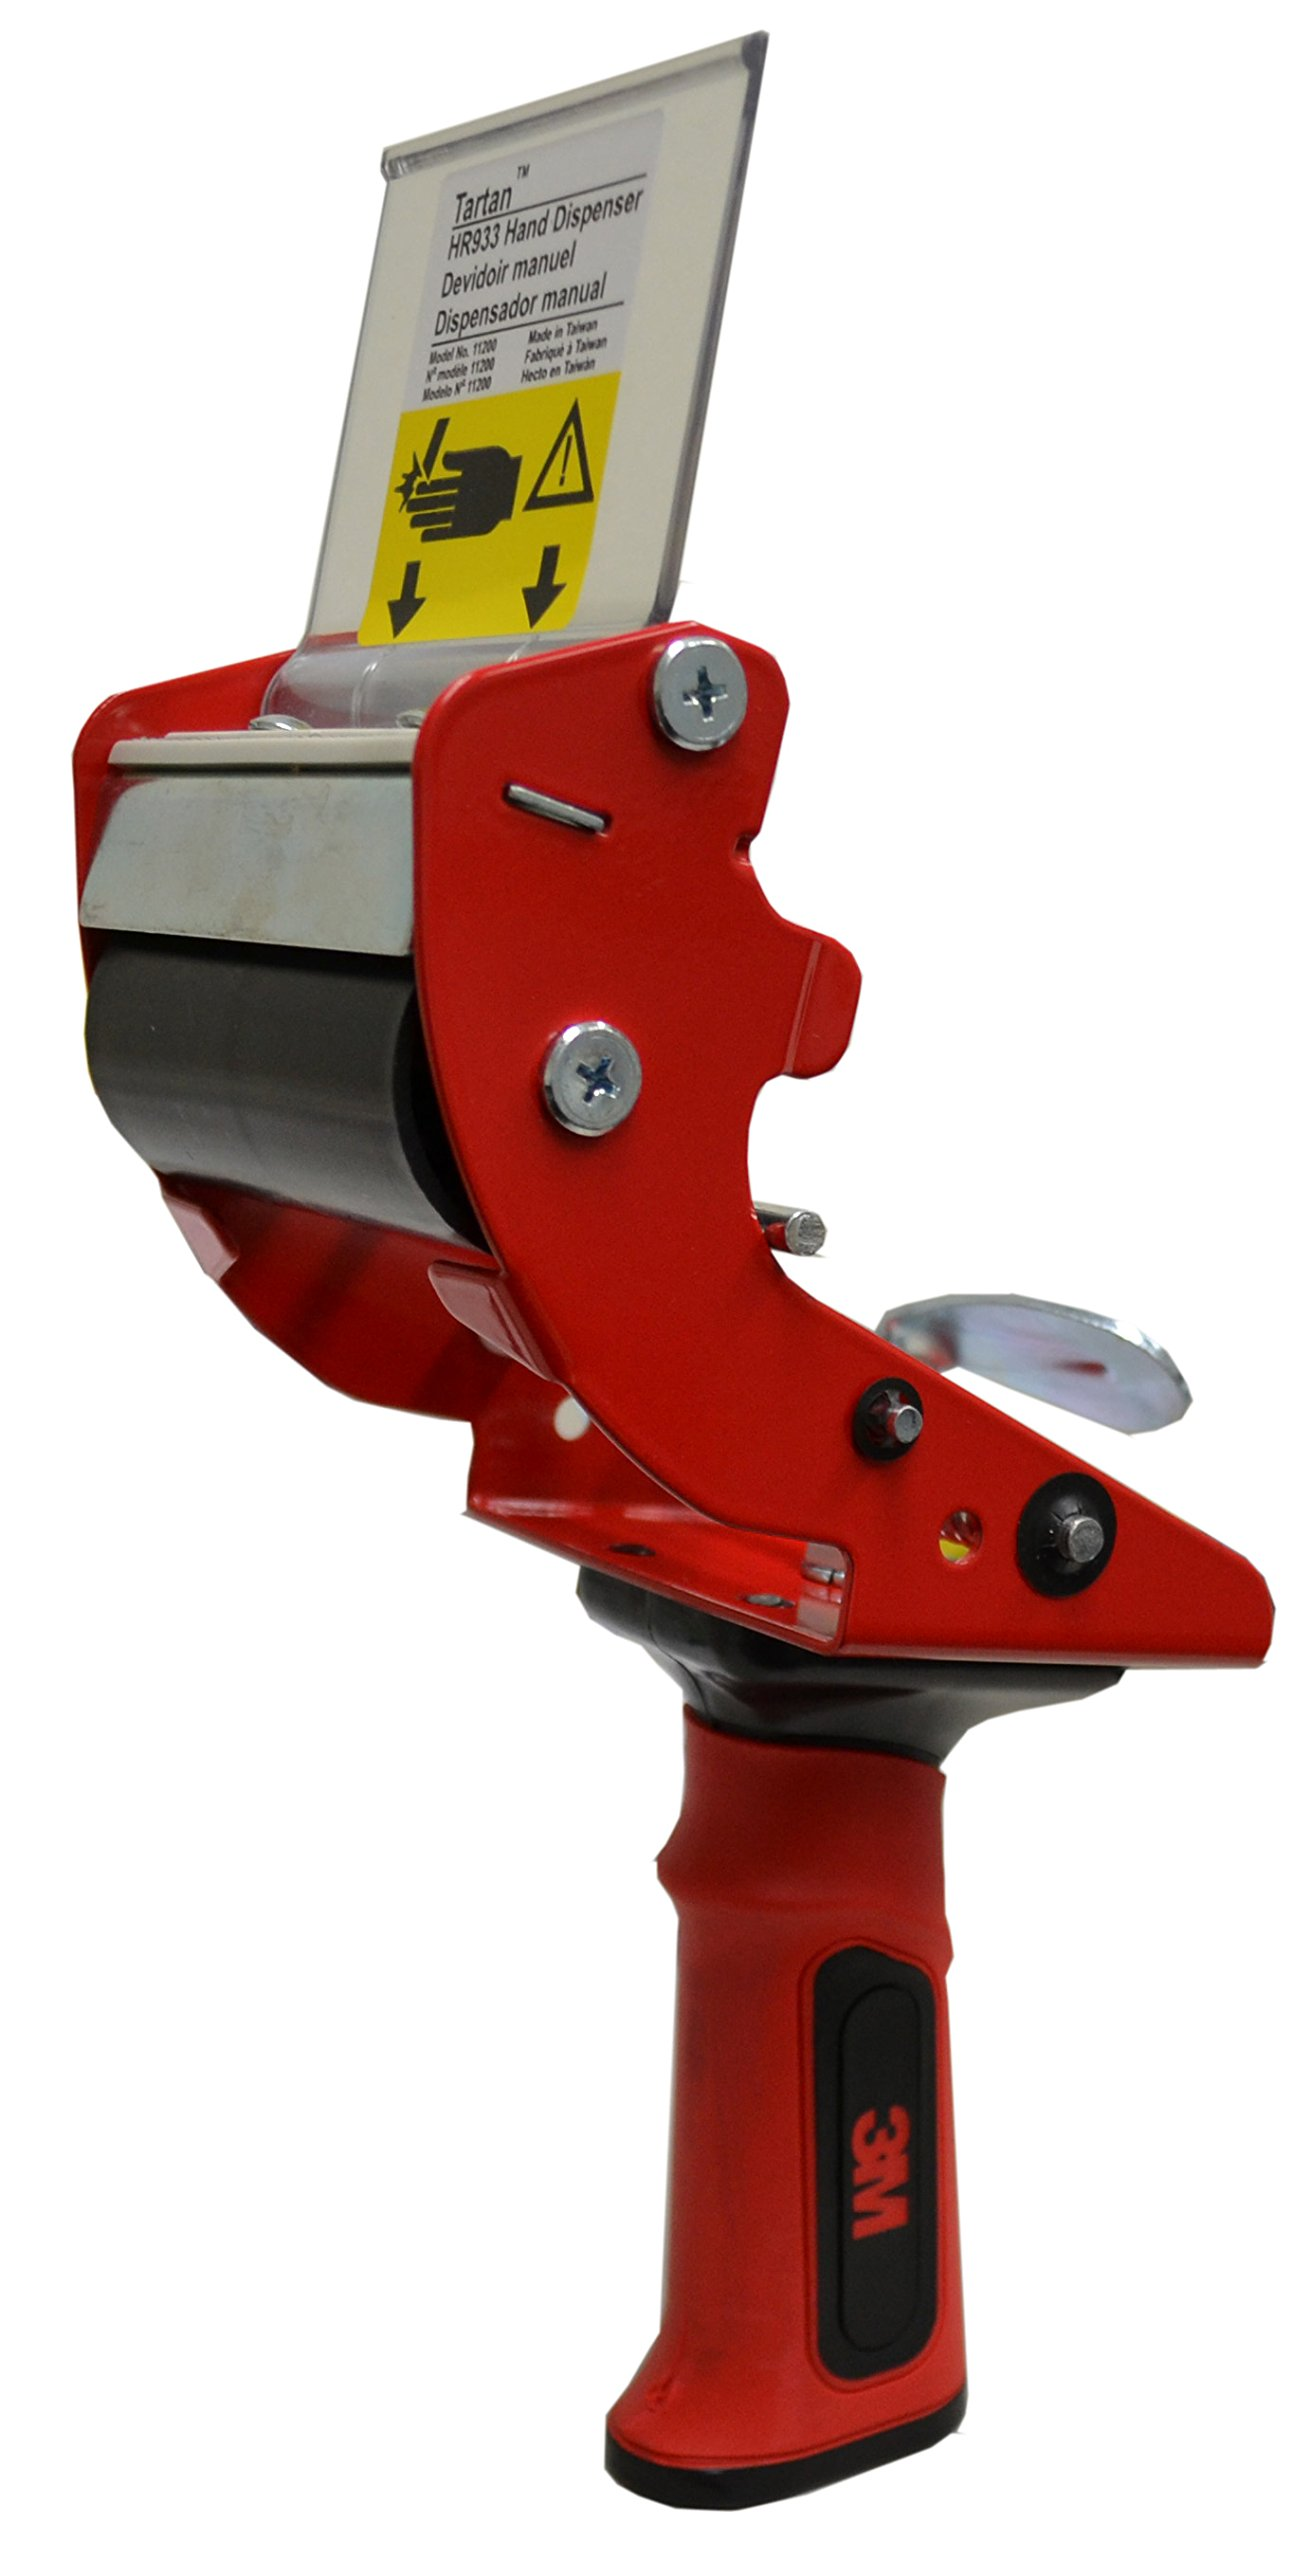 3M 3'' Heavy Duty Premium Tape Gun Dispenser - 3MTD-HB933 by Miller Supply Inc